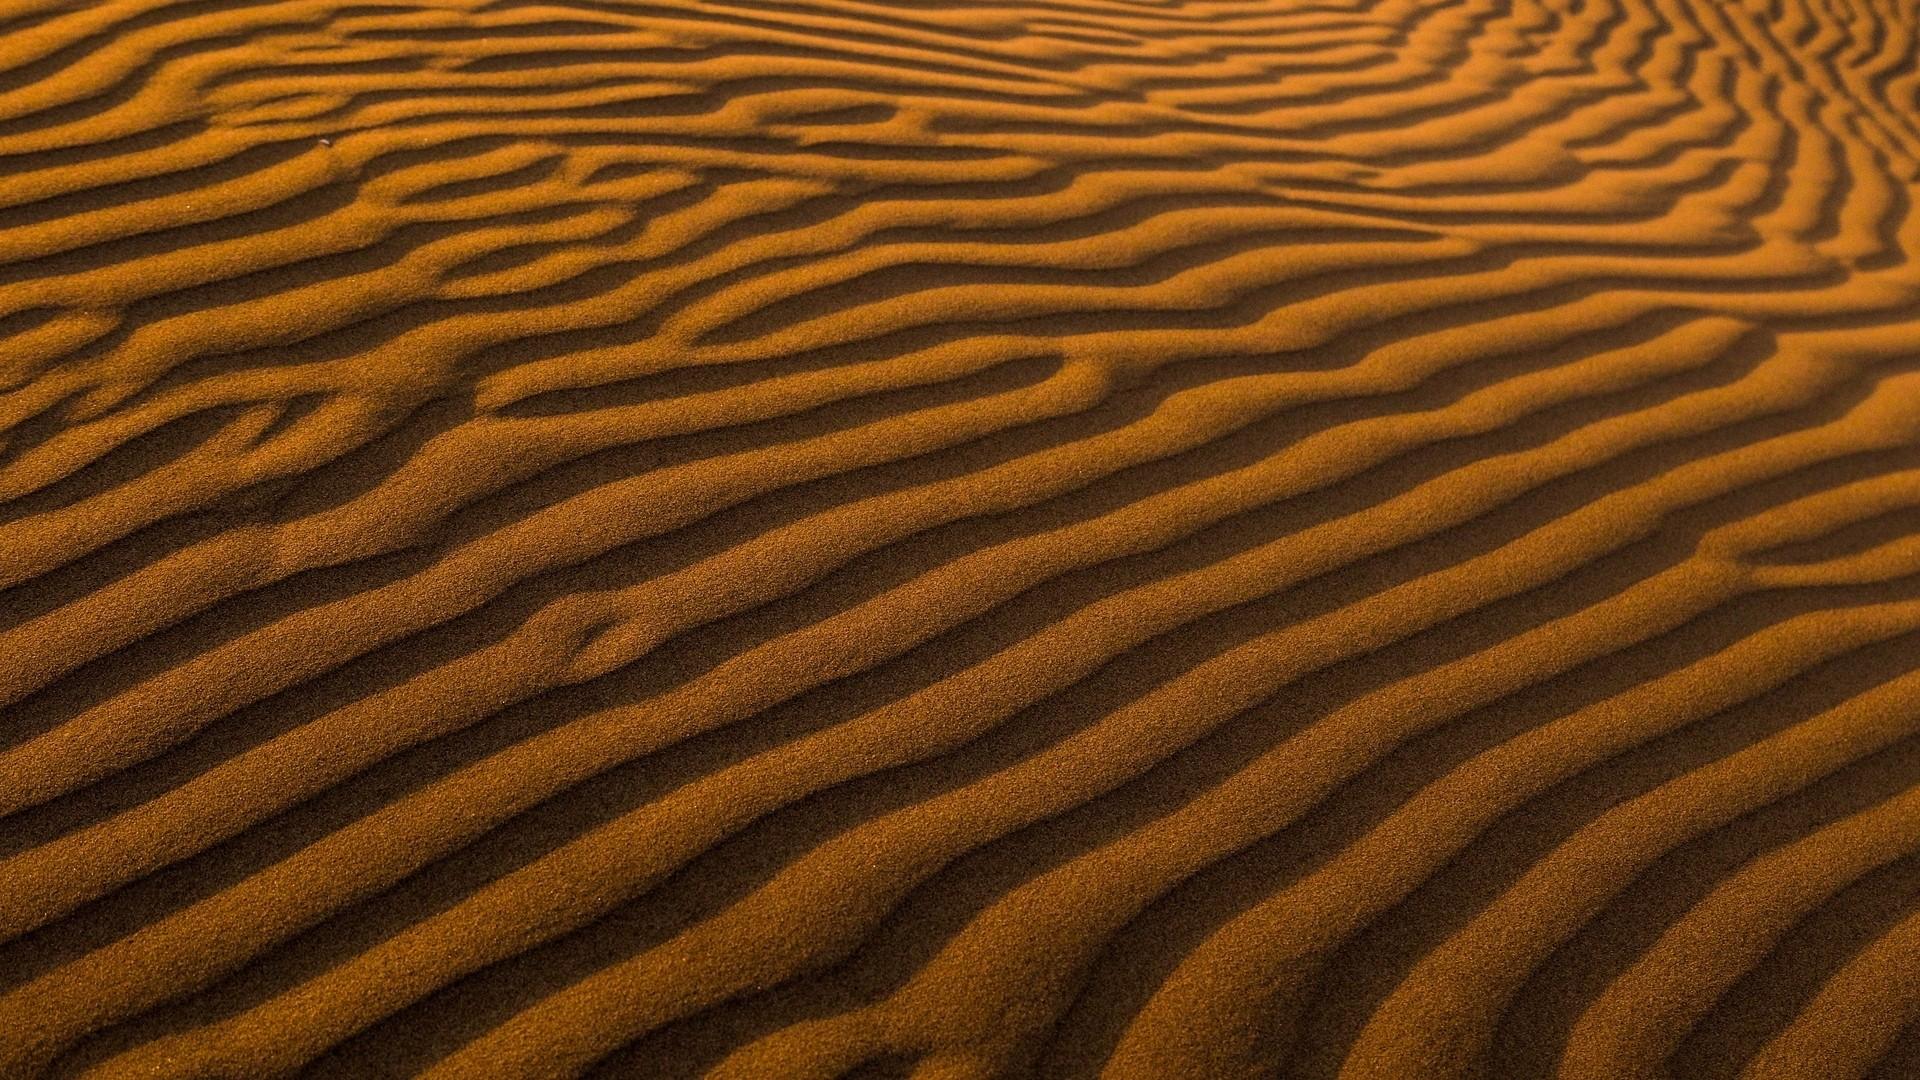 Sand download nice wallpaper